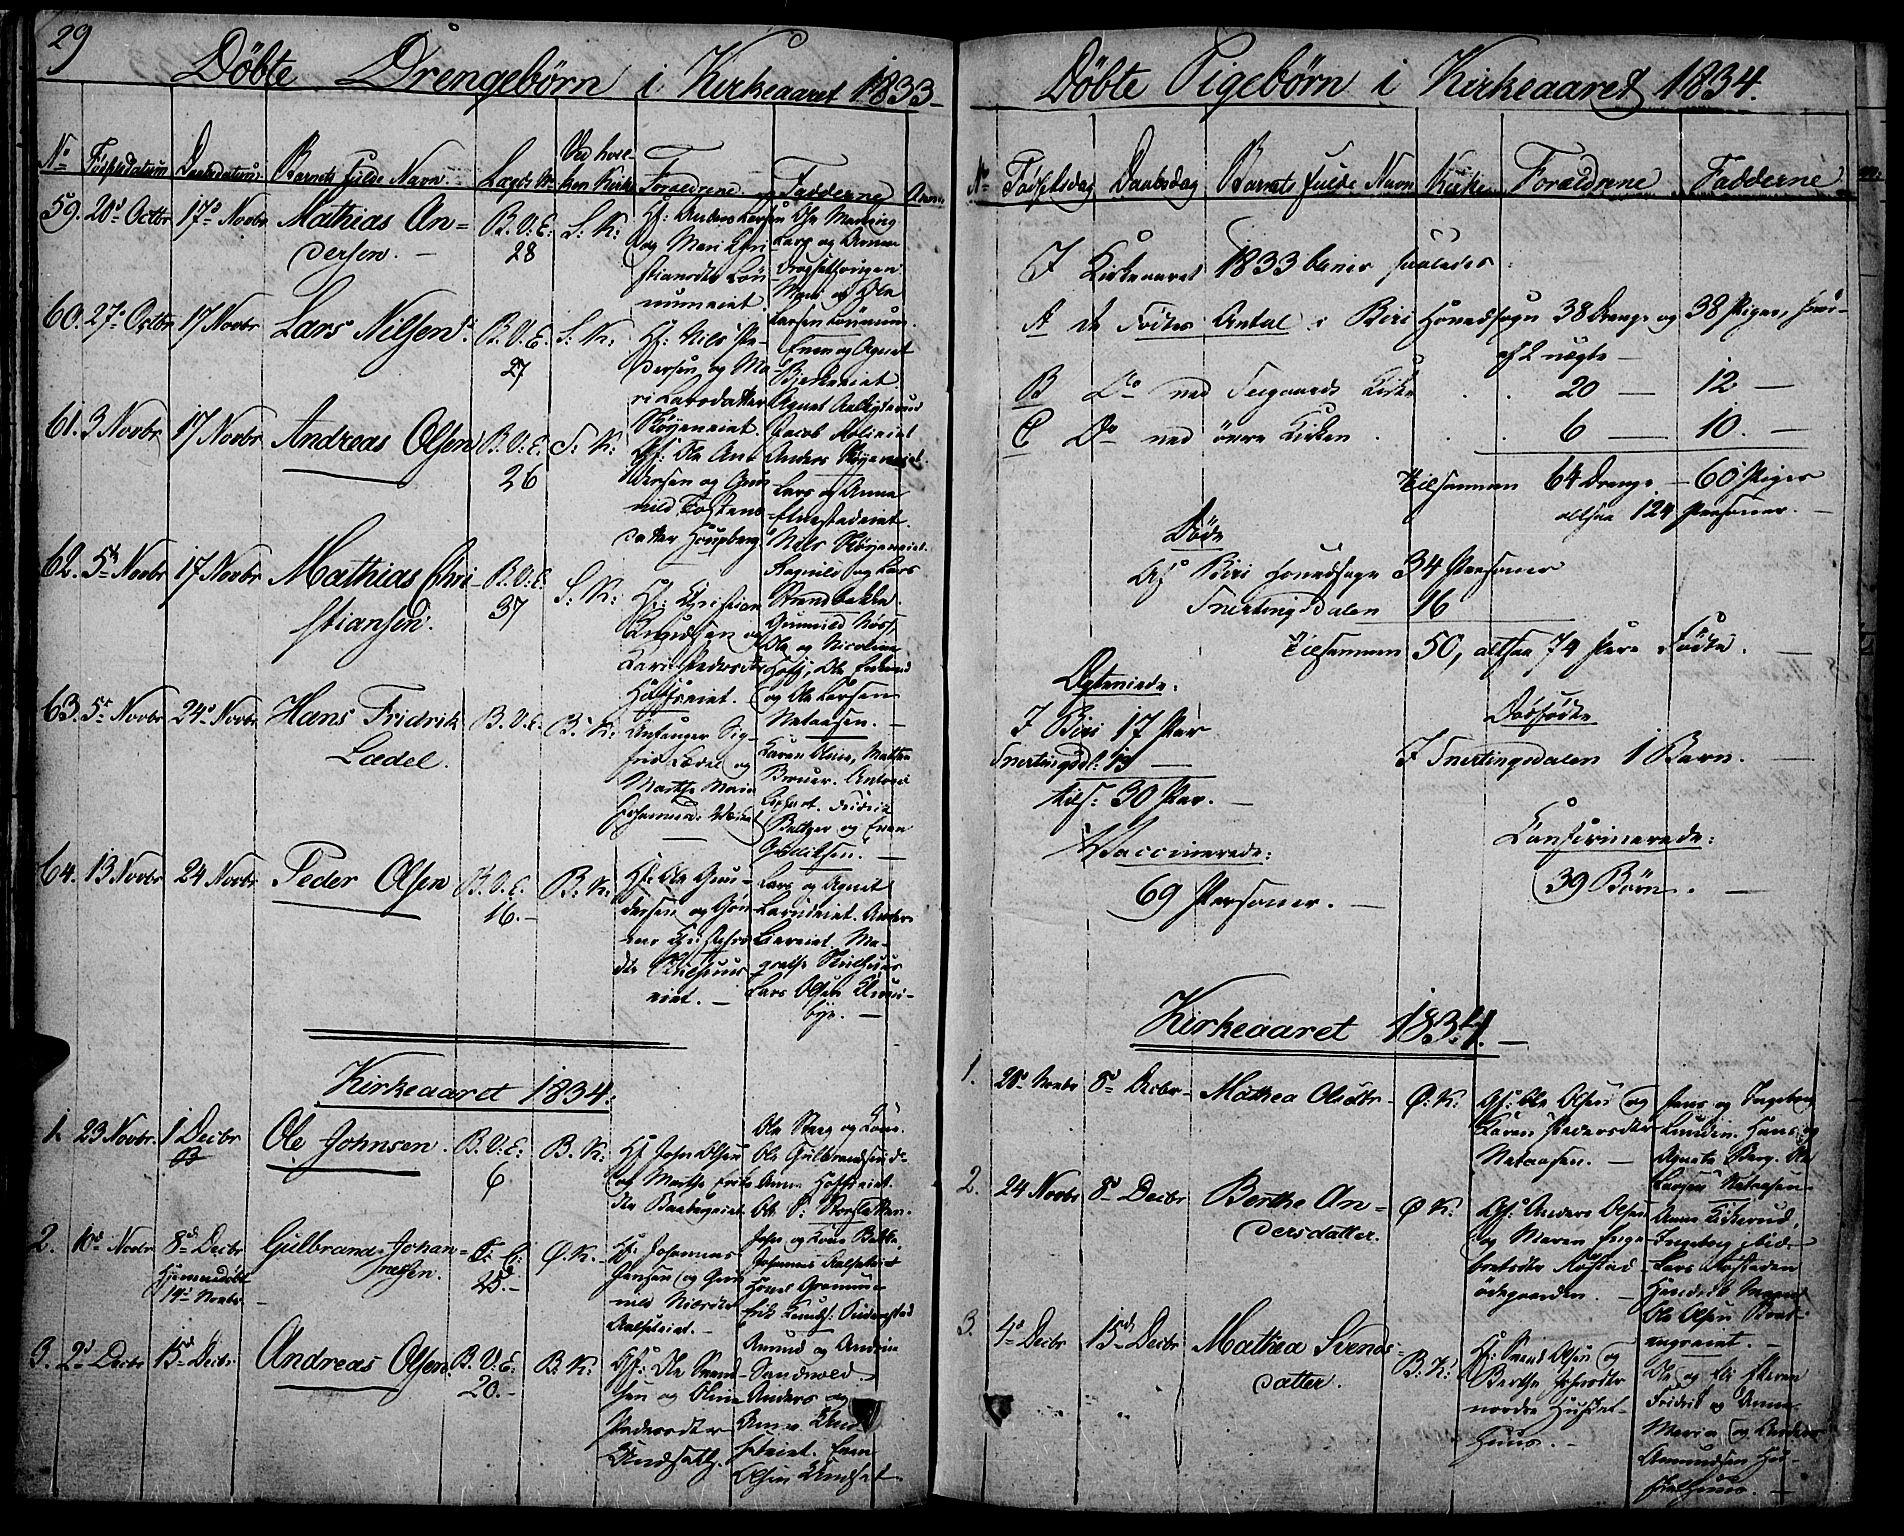 SAH, Biri prestekontor, Ministerialbok nr. 4, 1829-1842, s. 29